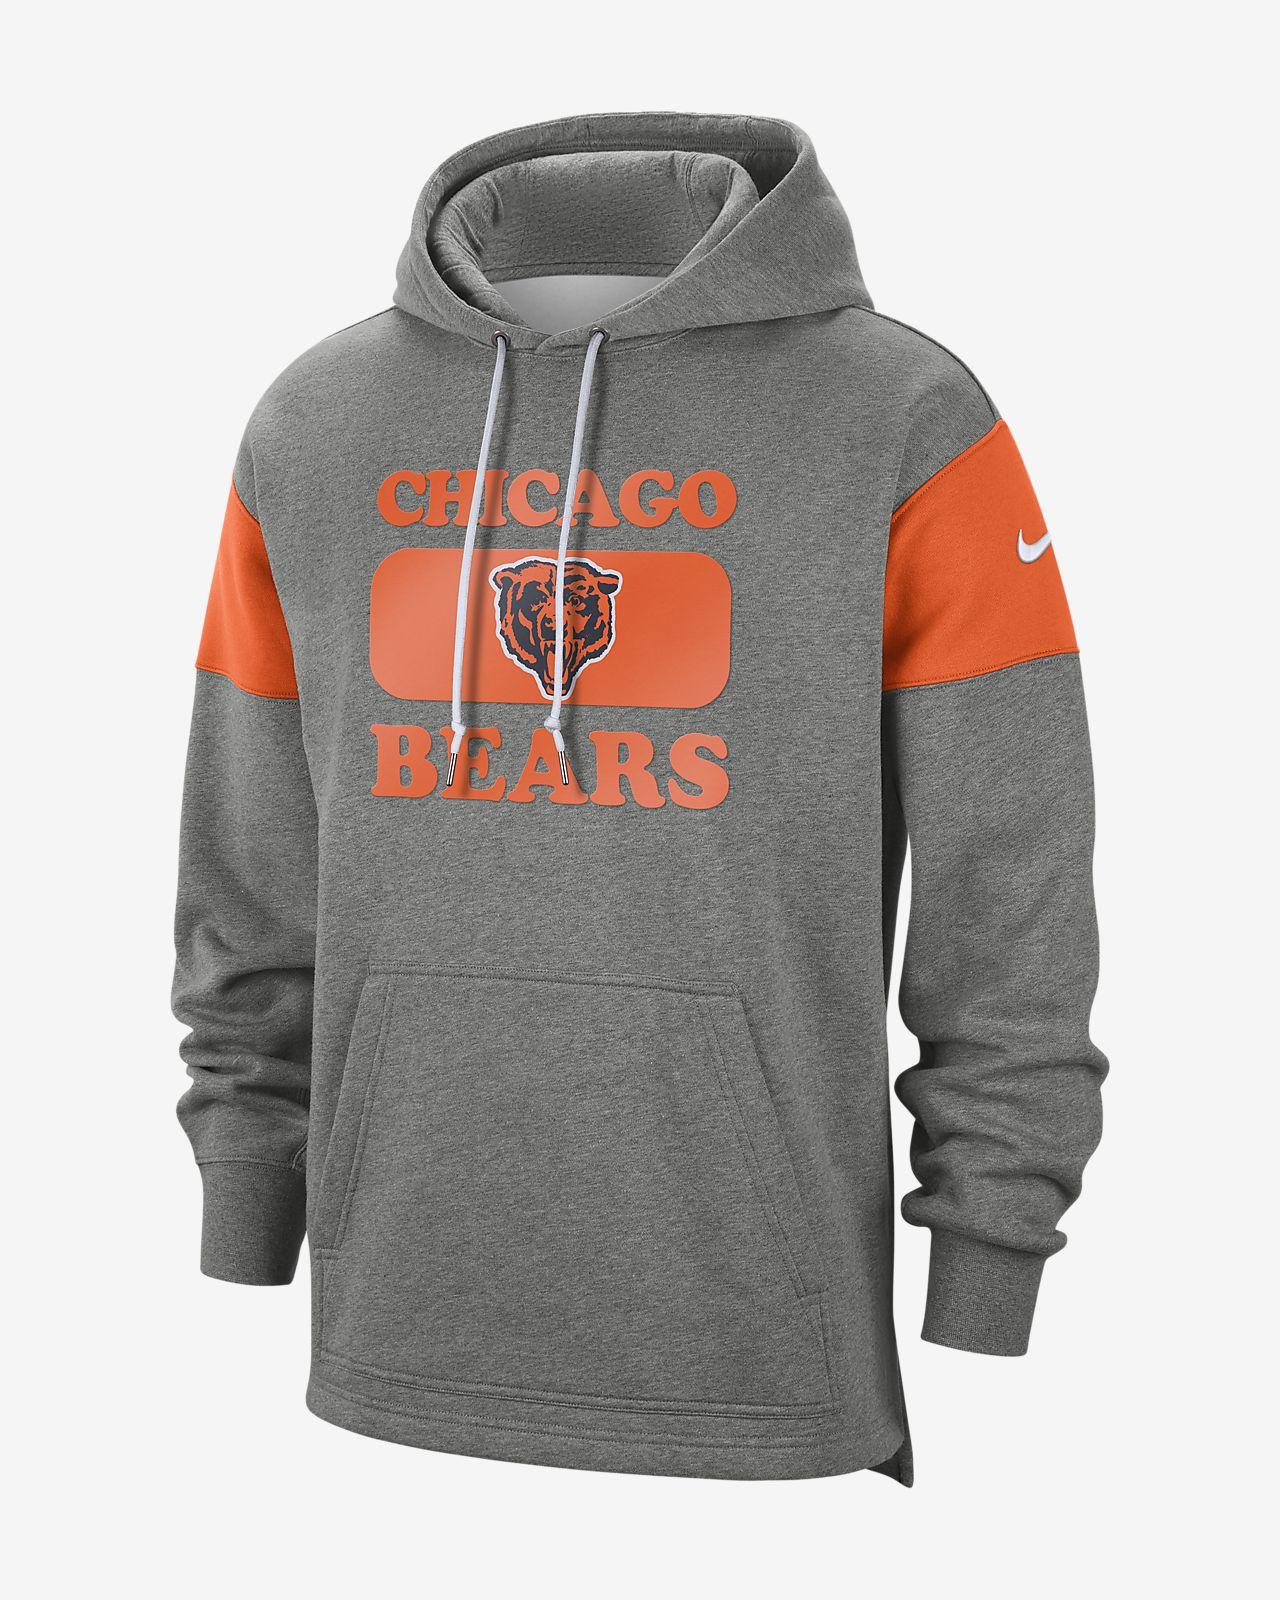 on sale da119 6602d Nike (NFL Bears) Men's Hoodie